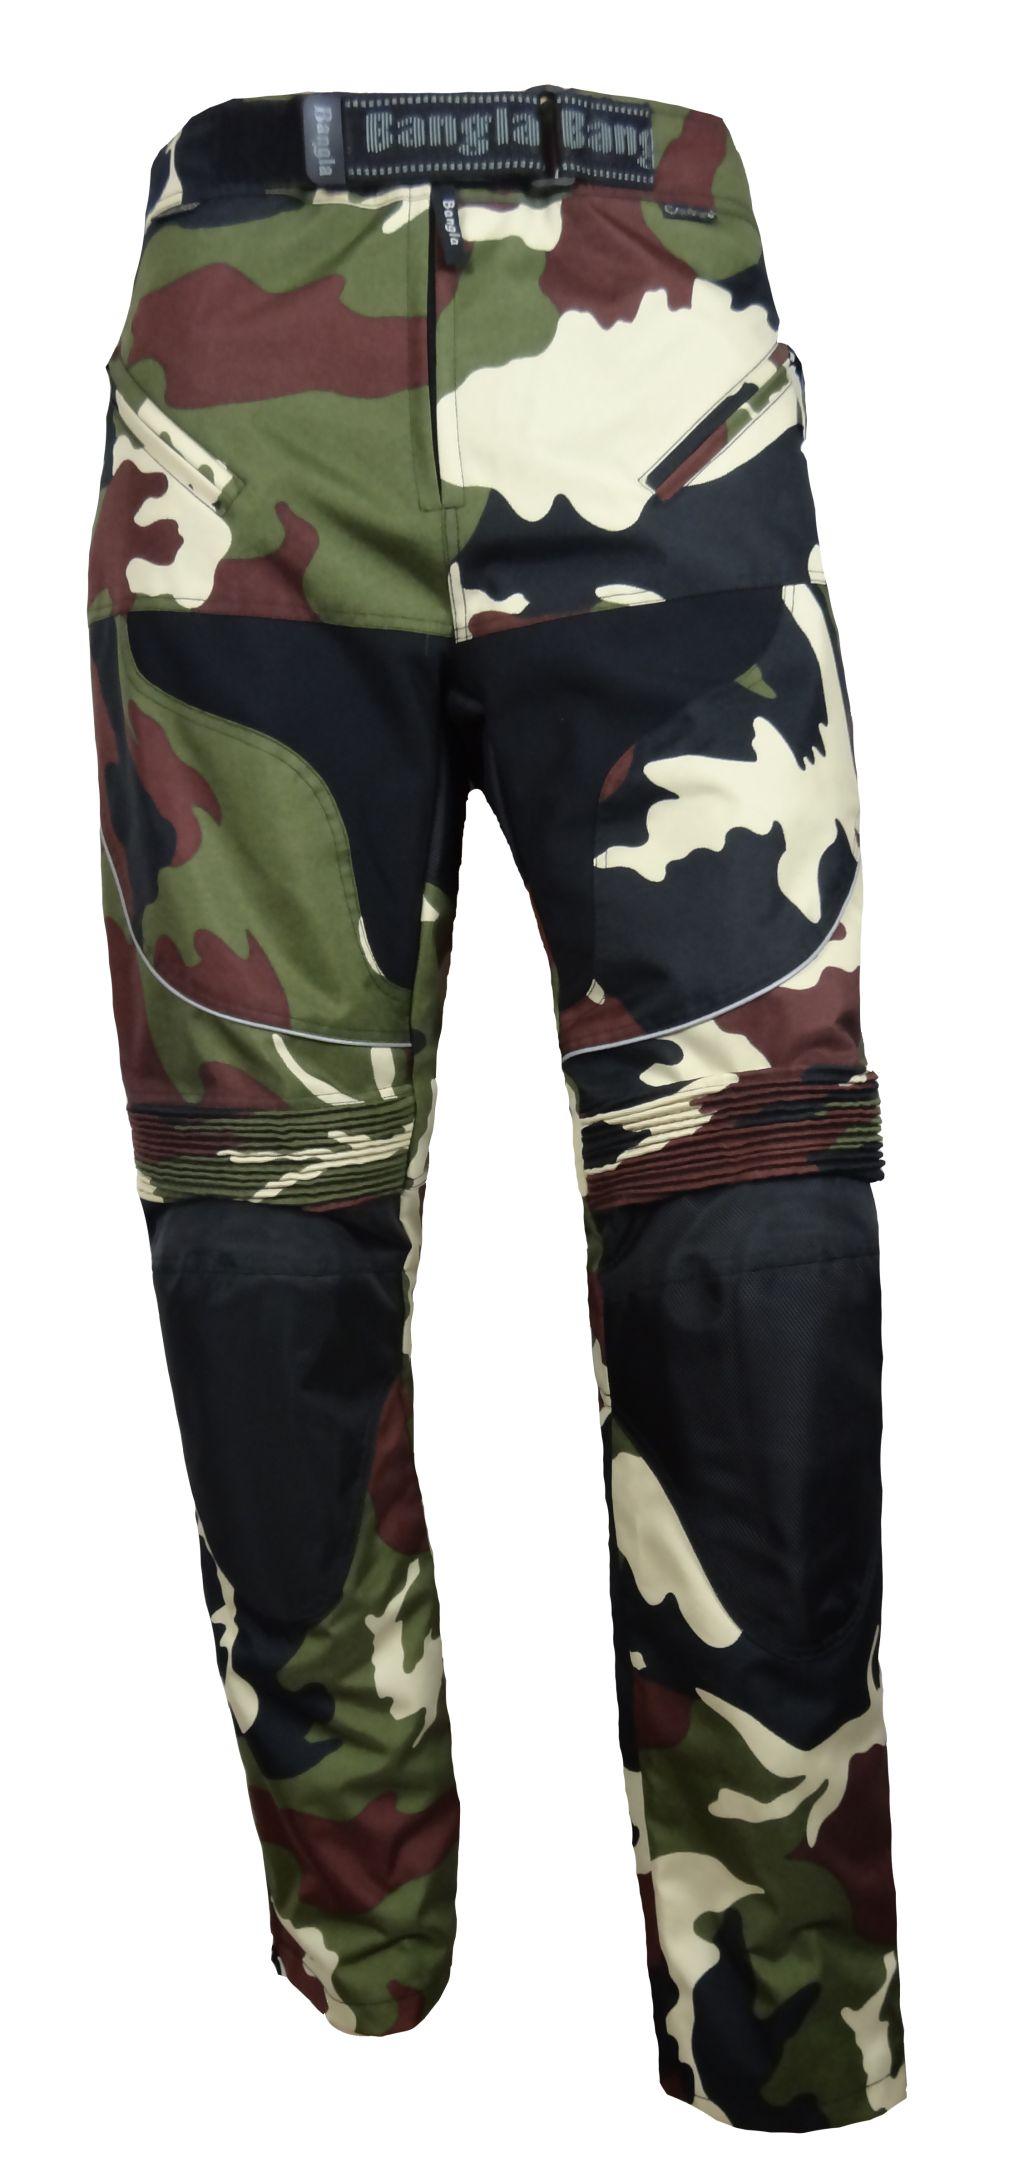 Motorradhose Herren Tourenhose Bangla Camouflage Gruen S bis 5 XL